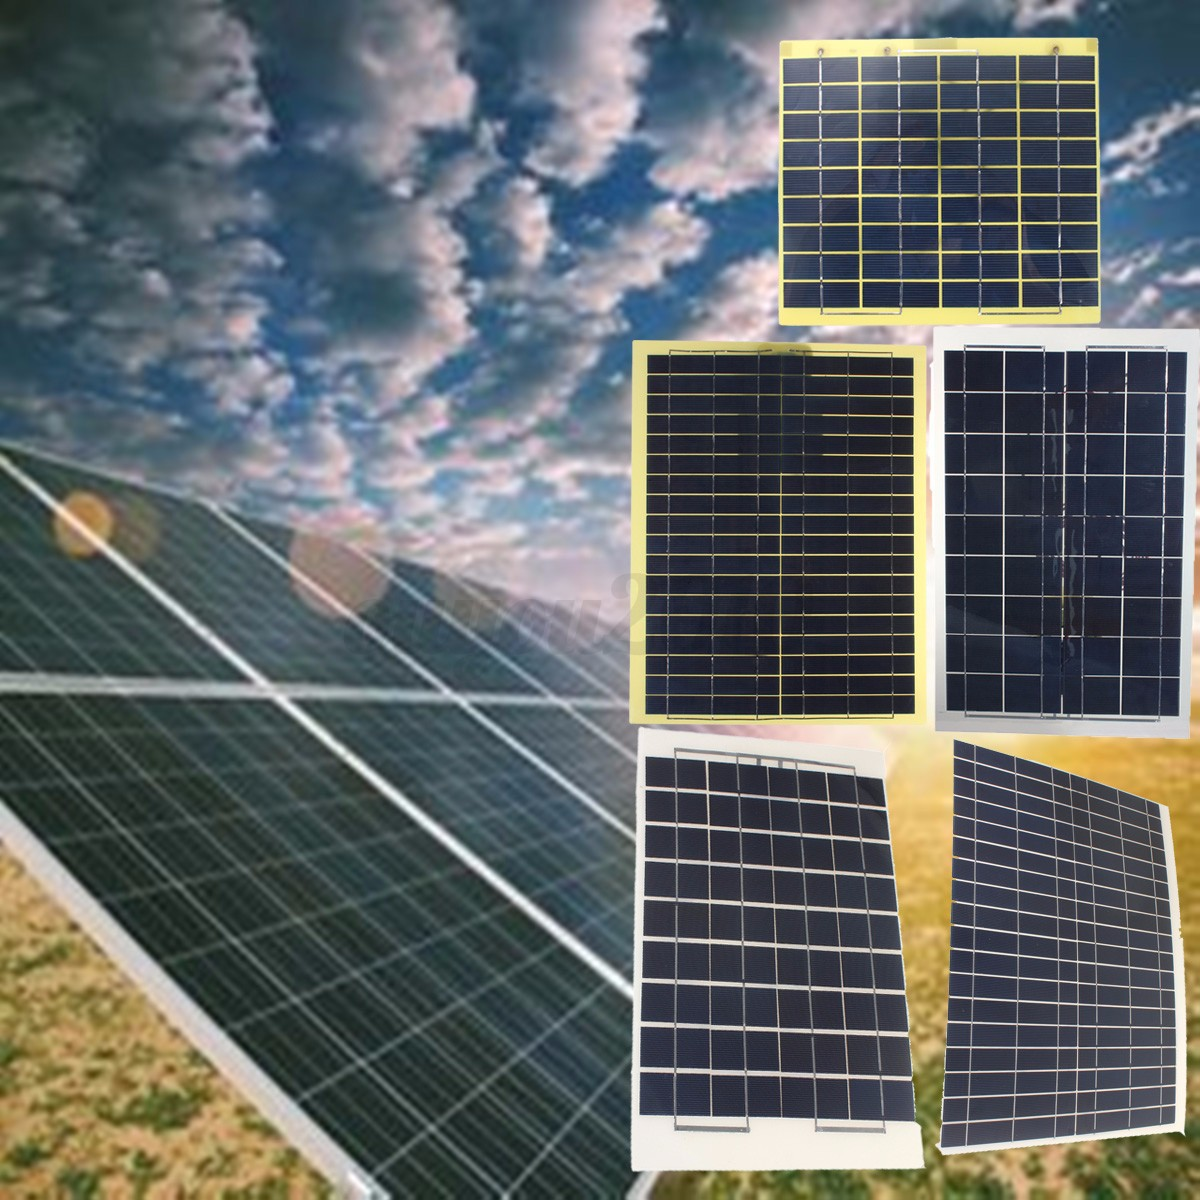 ... & Solar > Alternative & Solar Energy > Other Alt. & Solar Energy